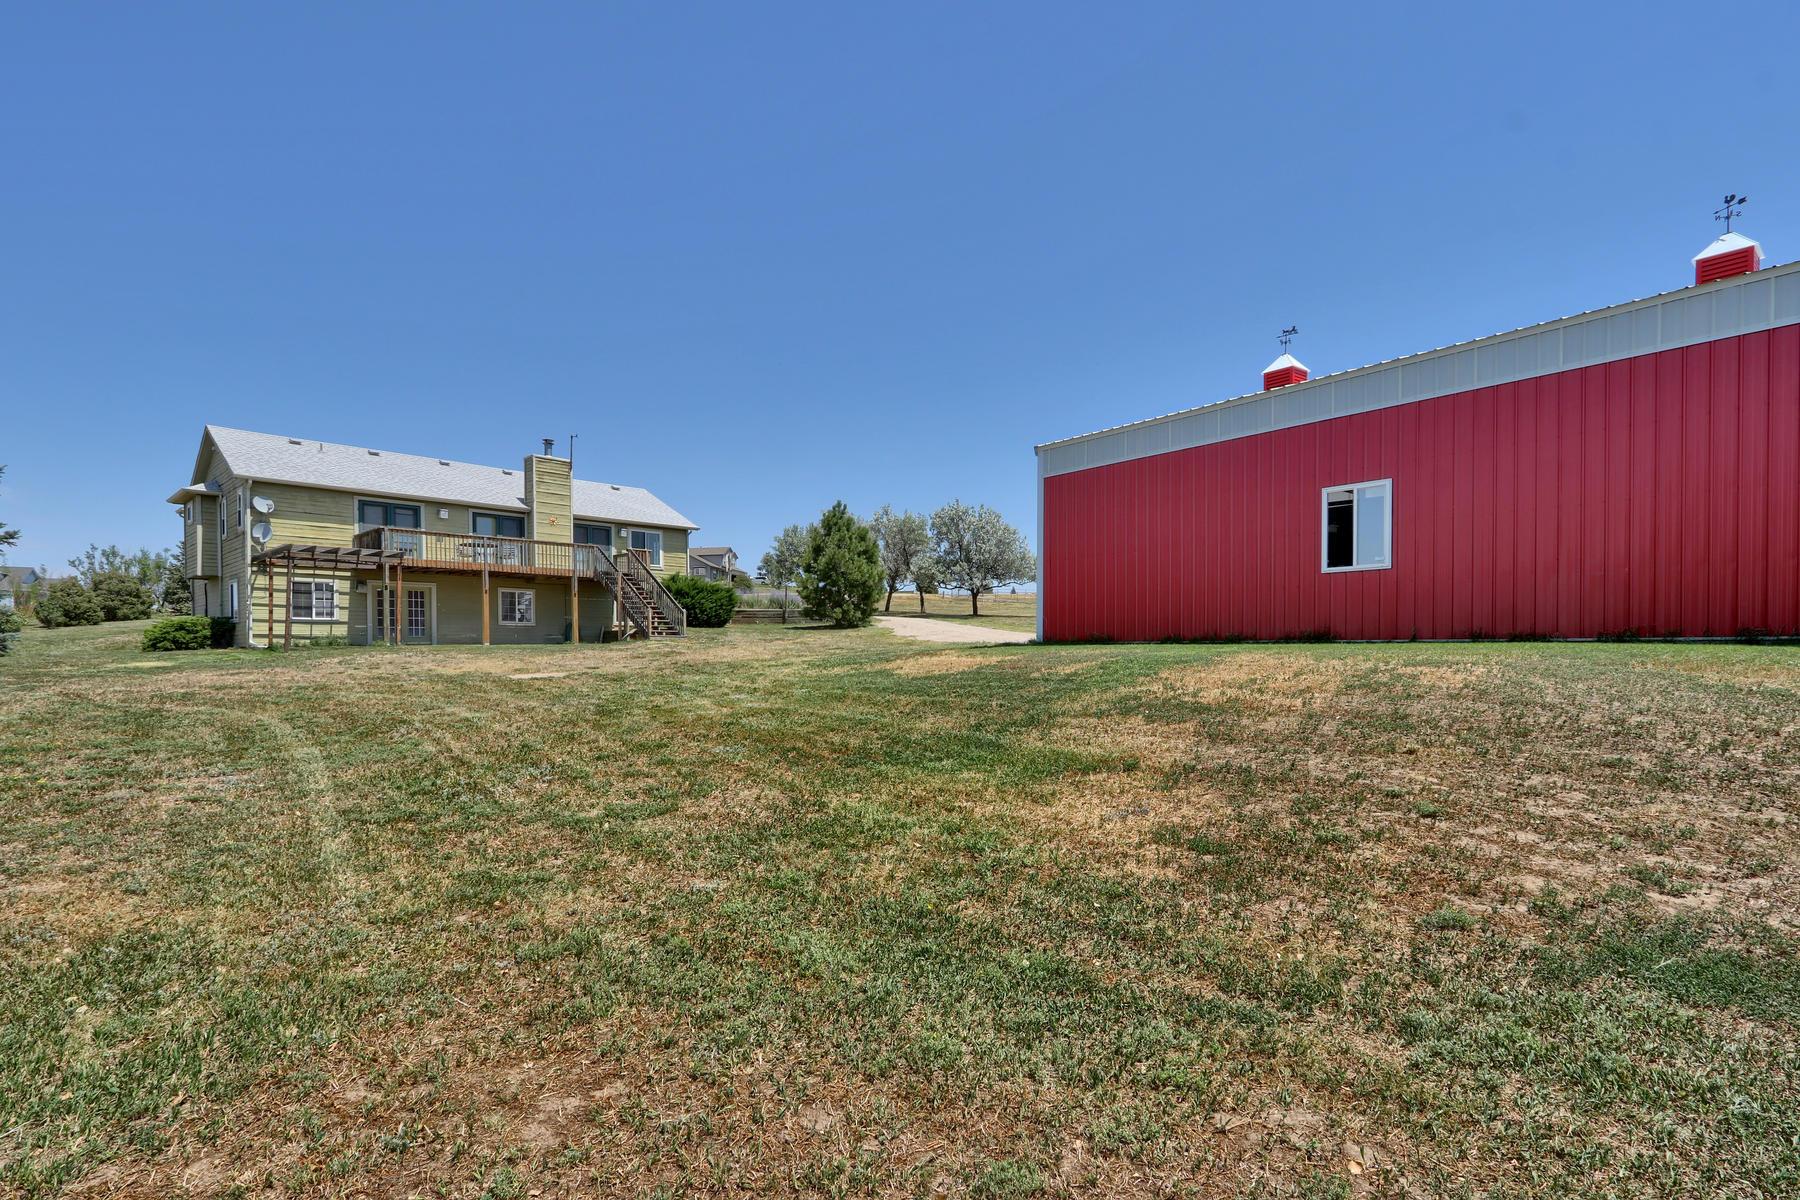 Single Family Homes for Active at 7174 S Shenandoah Drive Elizabeth, Colorado 80107 United States